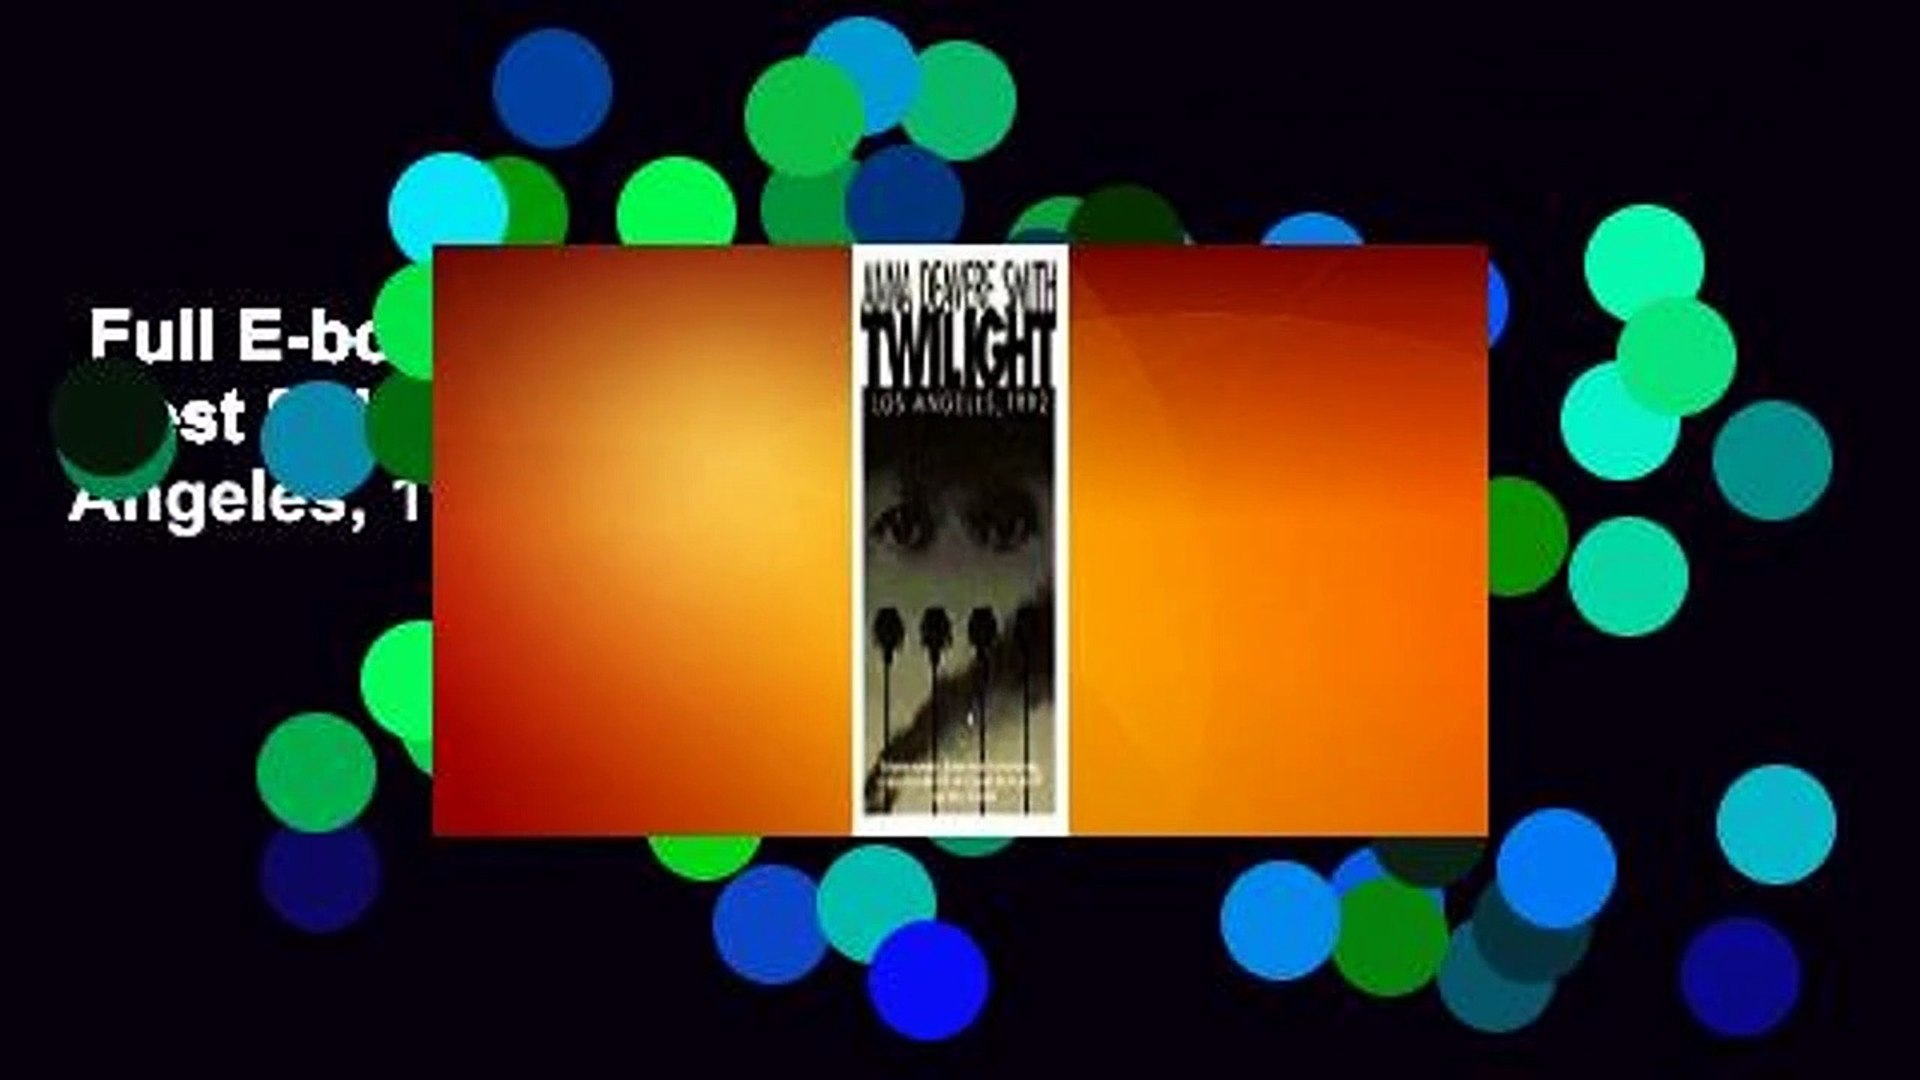 Full E-book  Twilight: Los Angeles, 1992  Best Sellers Rank : #1  Twilight: Los Angeles, 1992